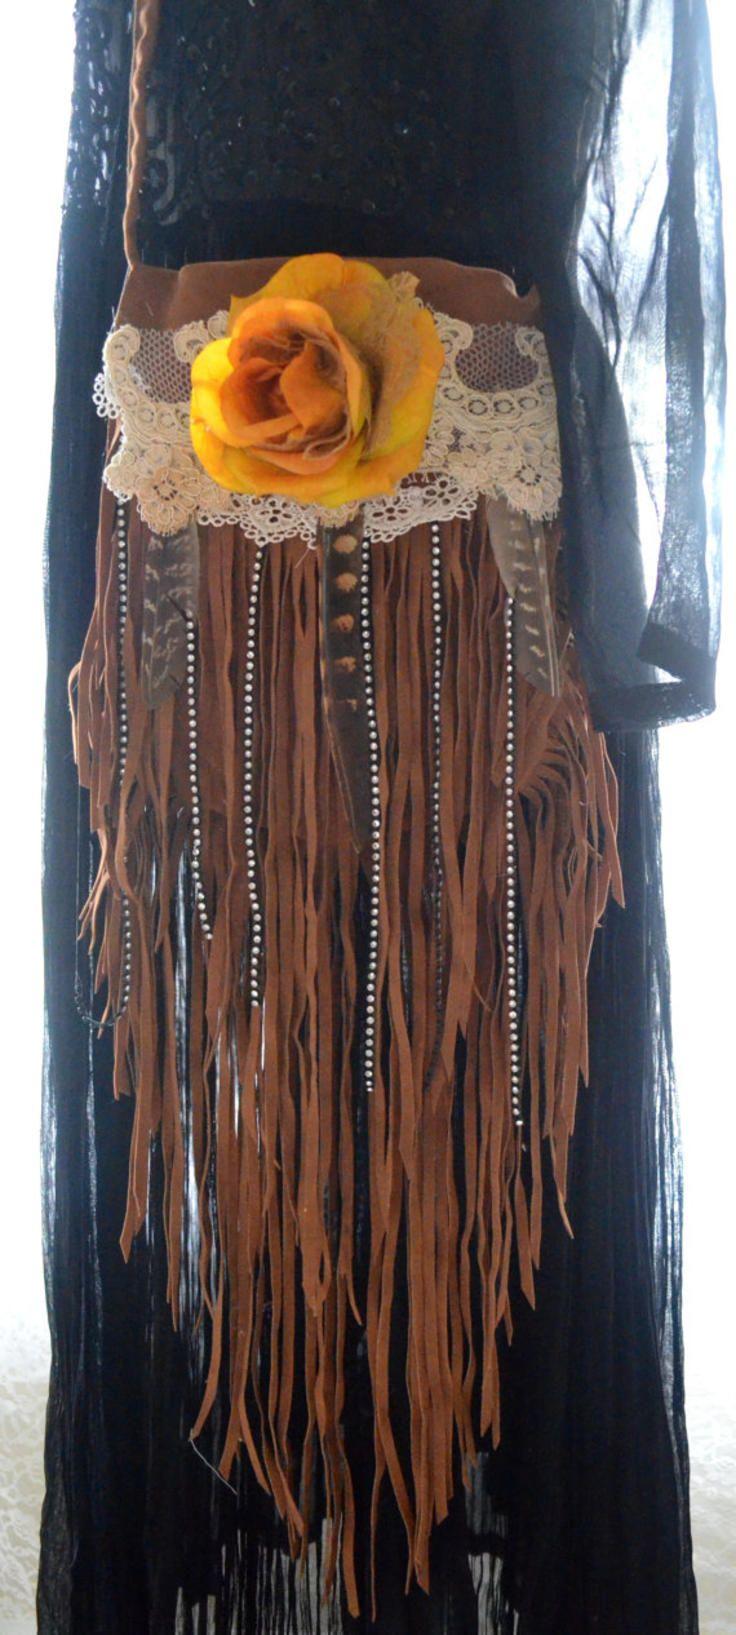 Gypsy purse, Bohemian Hobo bag, Stevie Nicks Concert bag Fringe Coachella purse, Romantic fringe purse, Fringed bag, True rebel clothing